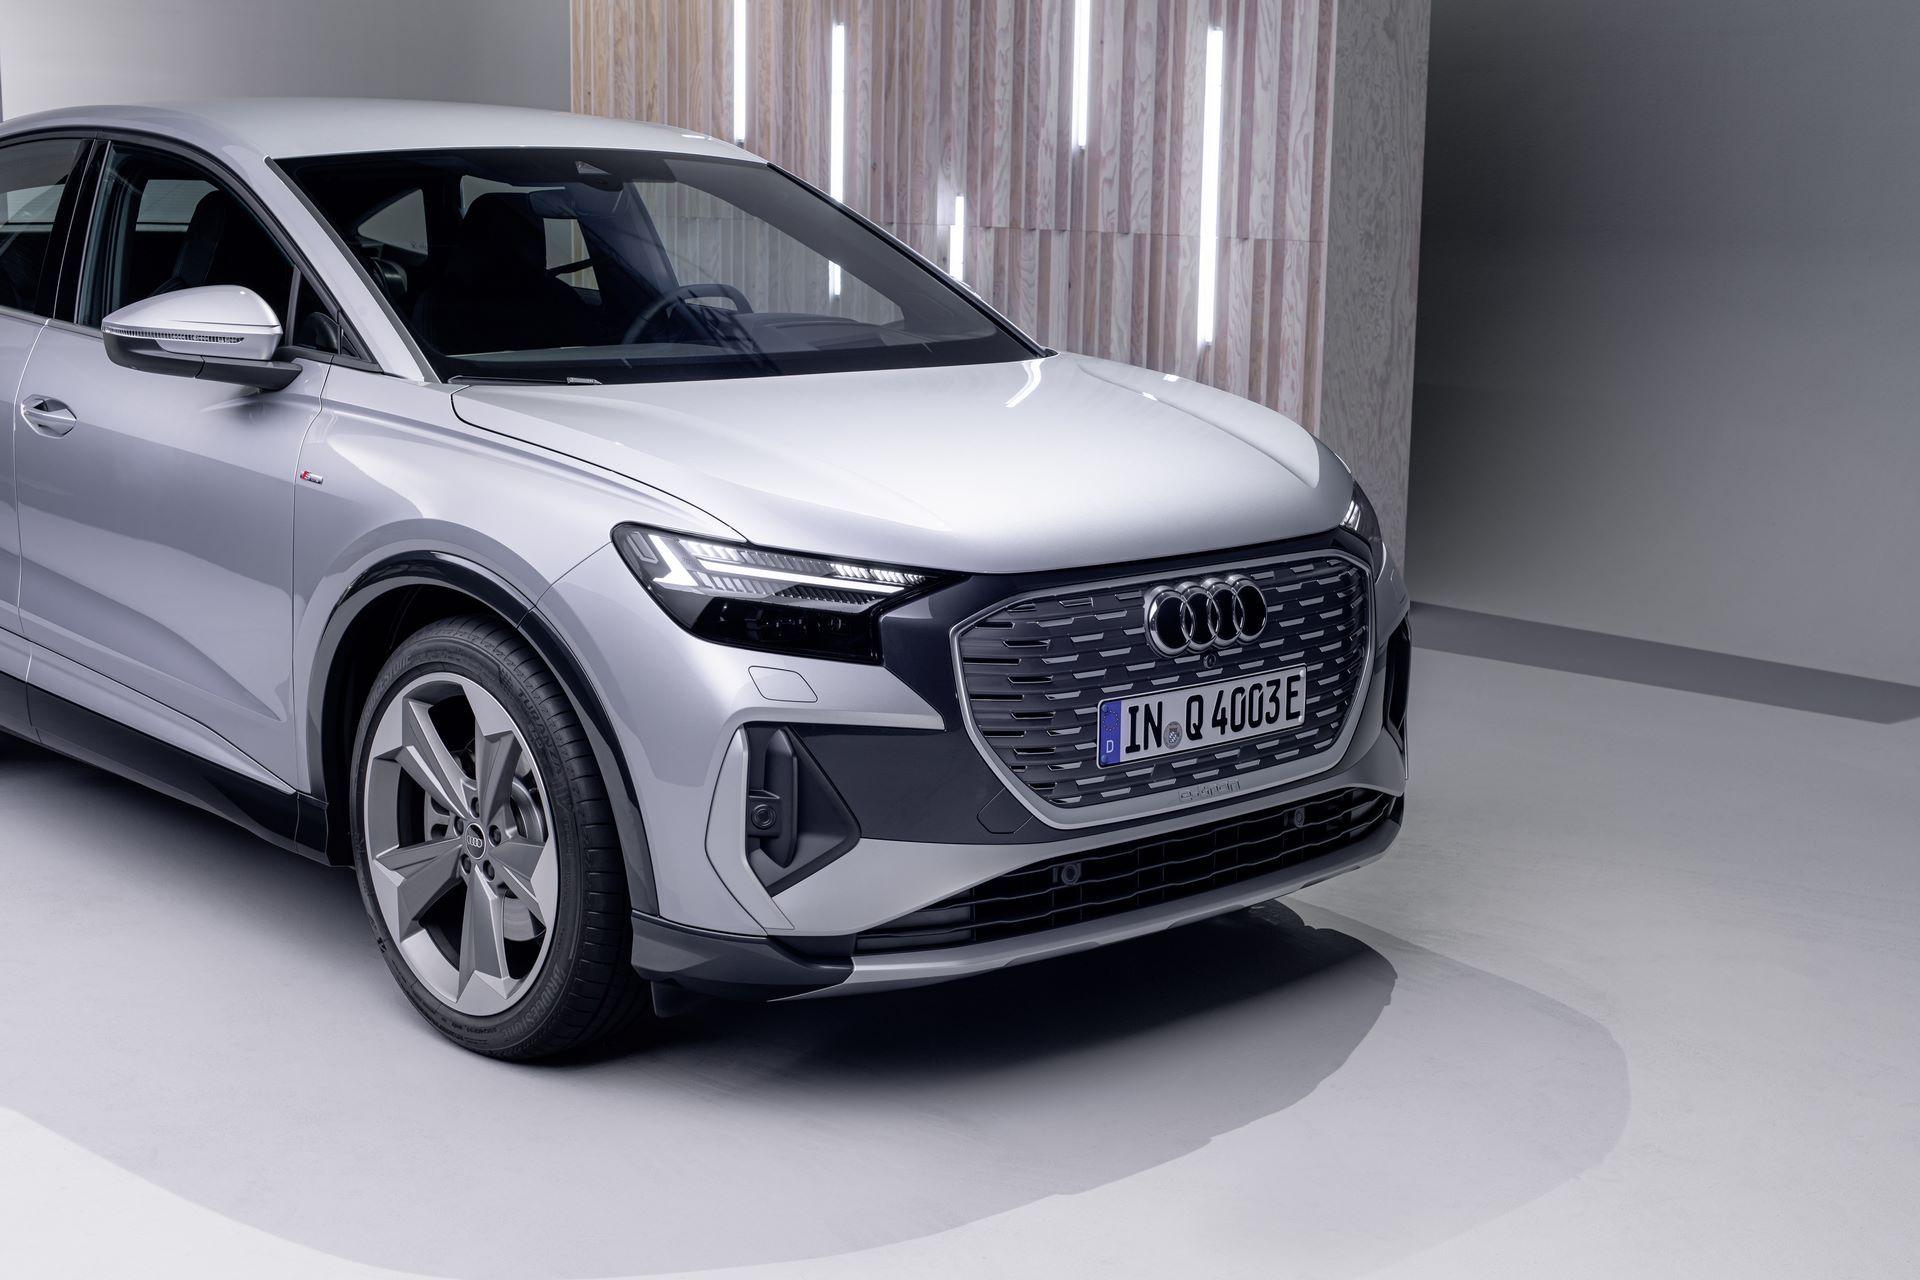 Audi-Q4-e-tron-and-Q4-e-tron-Sportback-163